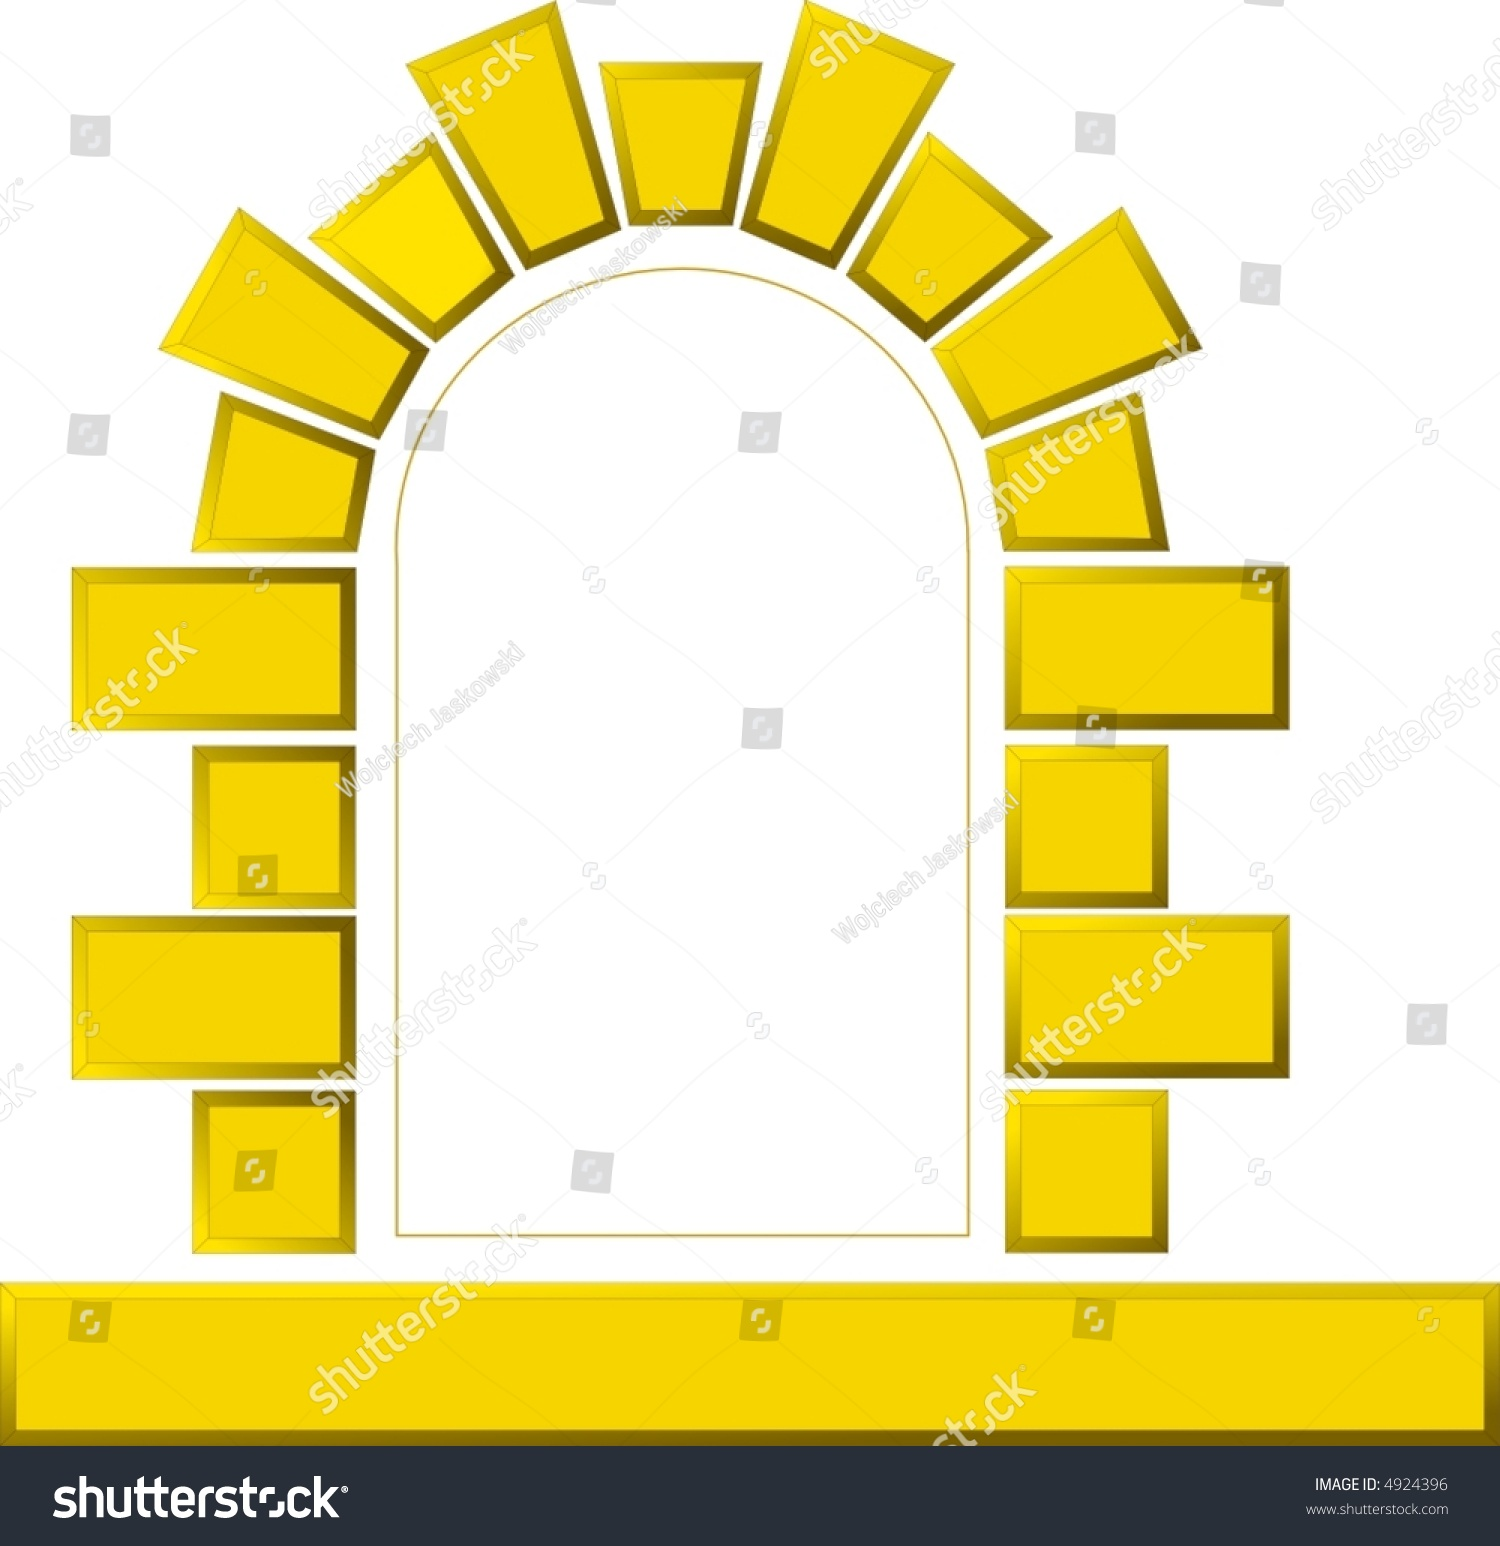 Vector Image Window Made Stones Wall Stock Vector 4924396 - Shutterstock